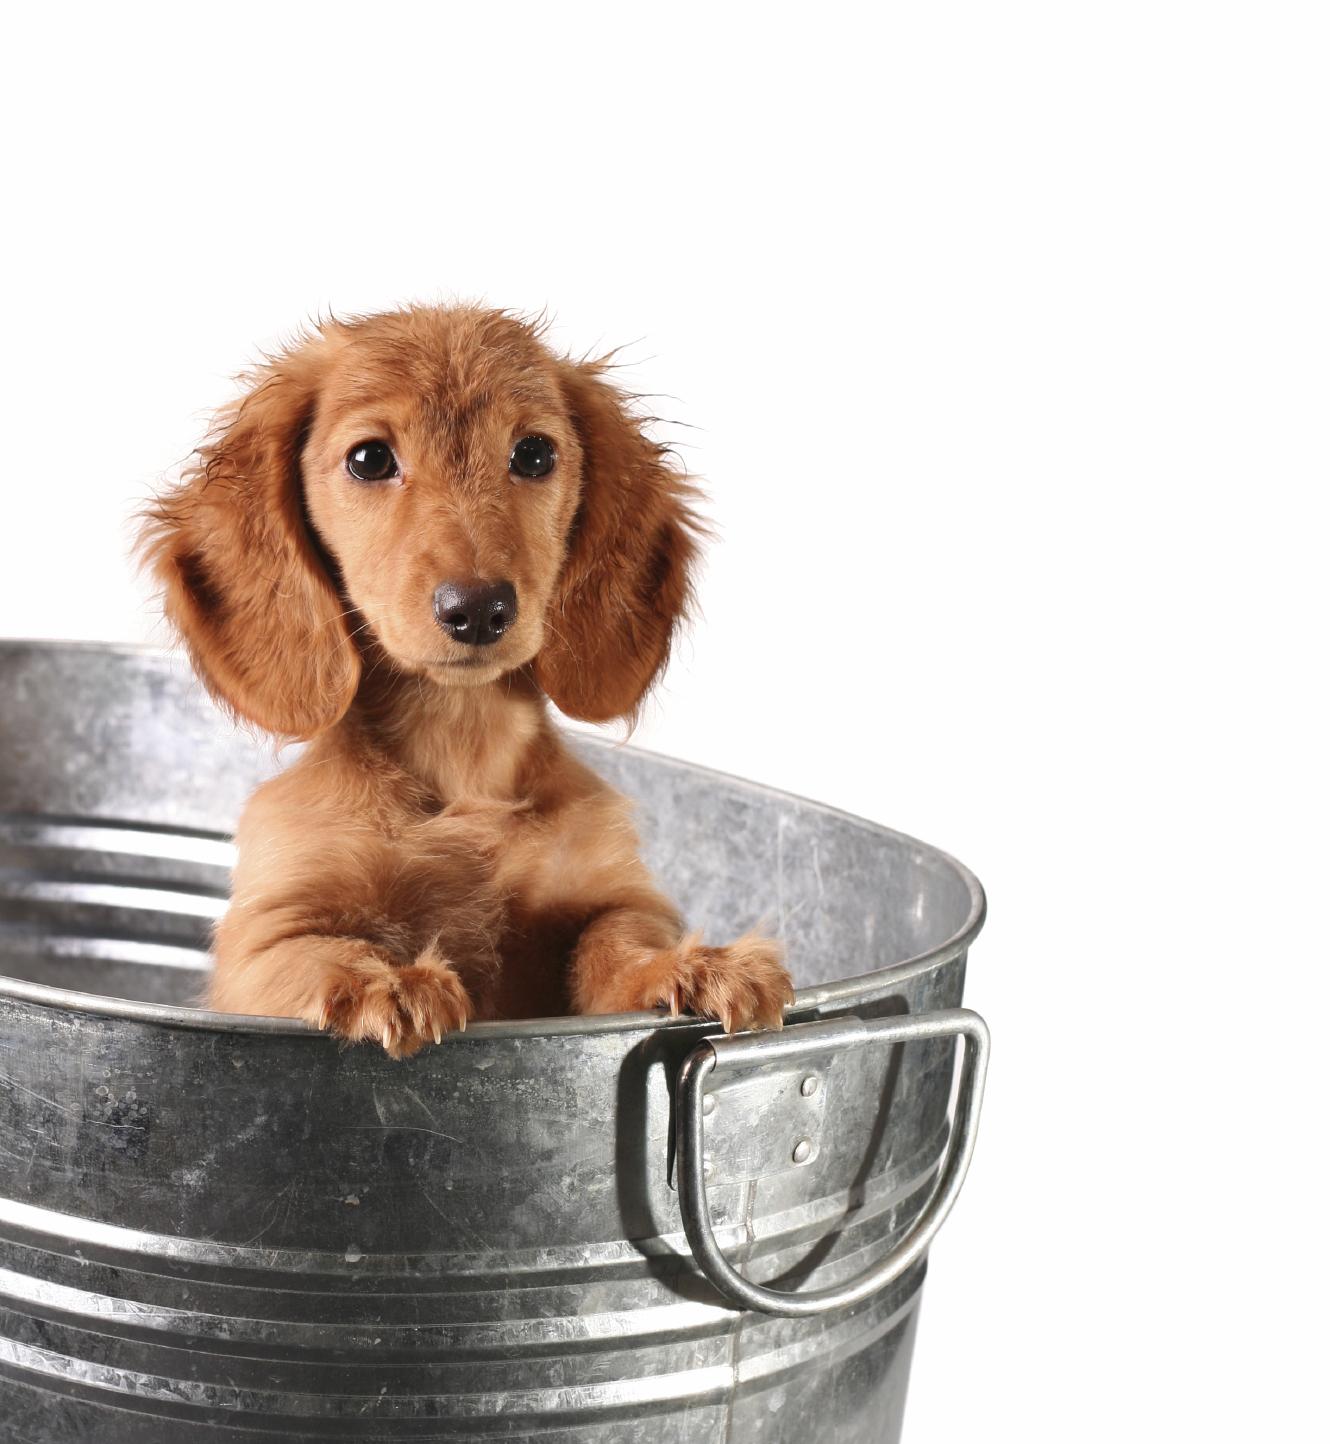 Erins_Pampered_Pets_Dog_Bucket